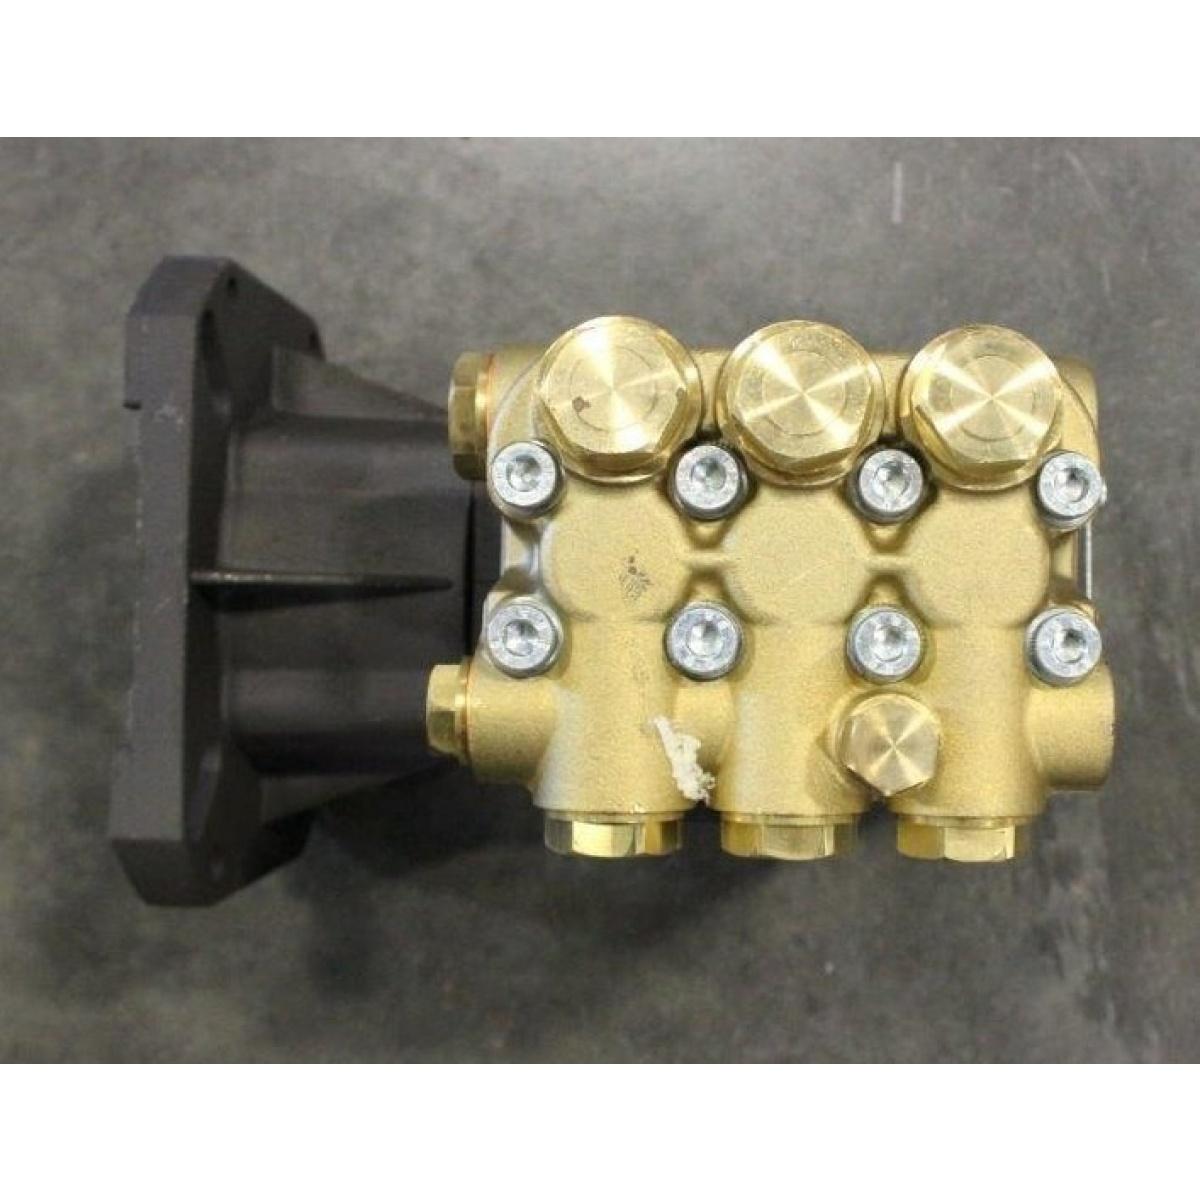 Pump, Legacy Gm6035r.3, 5.6@3500 1740 Rp